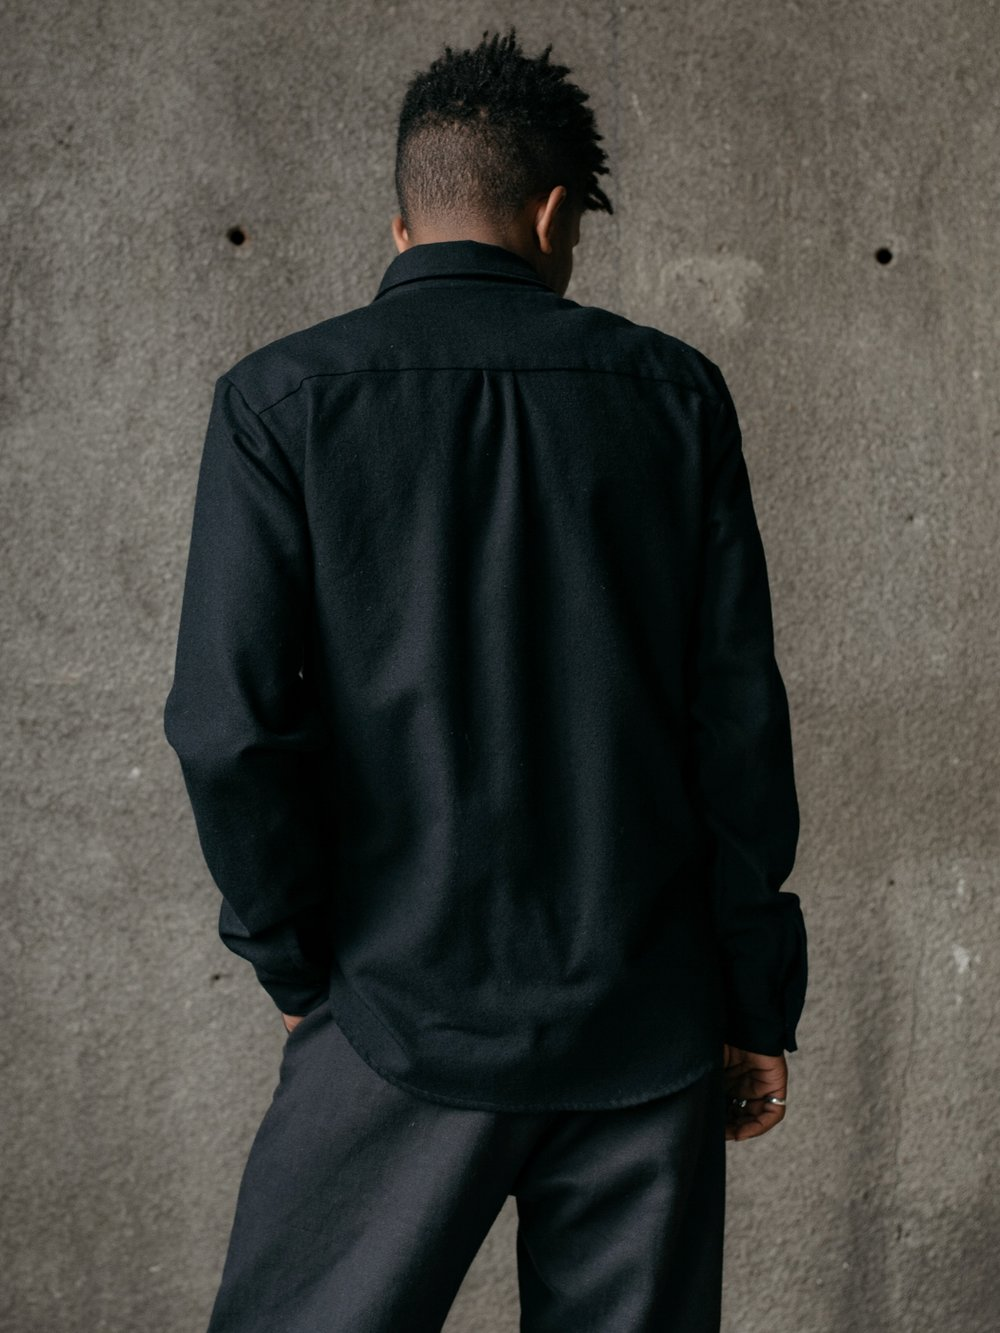 evan-kinori-two-pocket-shirt-navy-wool-cotton-flannel-fall-2017-2